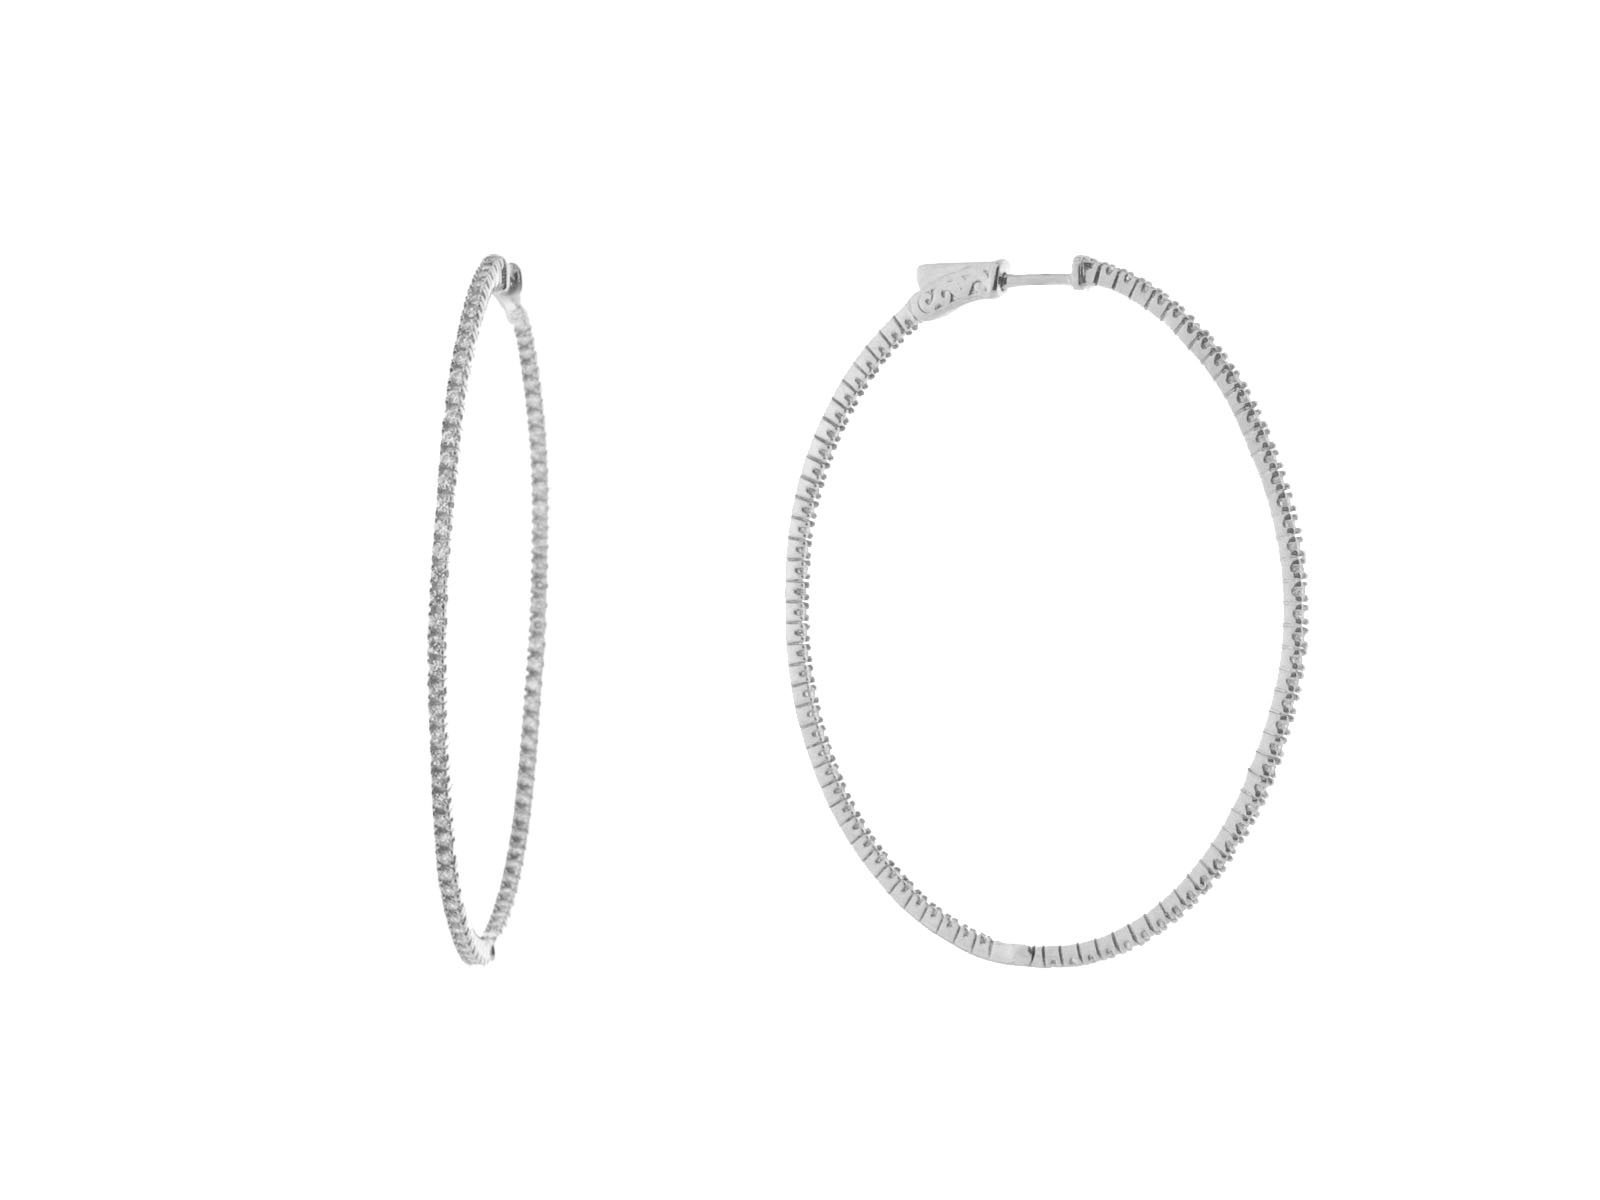 Fronay Co .925 Sterling SIlver Large Inside-Out CZ Oval Hoop Earrings